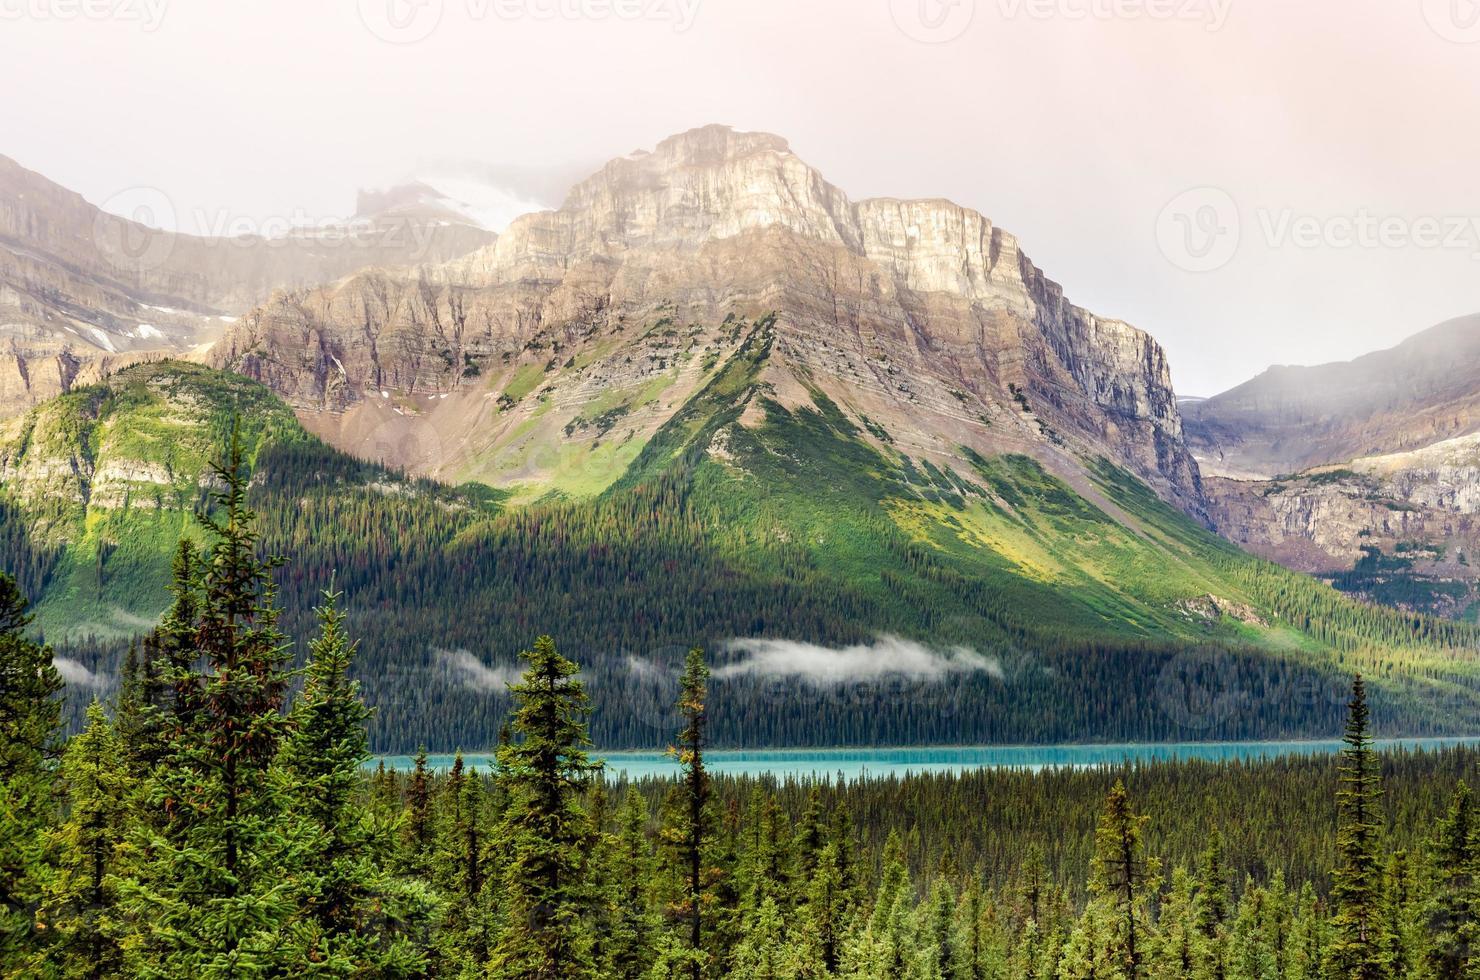 vista panoramica sulle montagne vicino a icefields parkway, montagne rocciose canadesi foto